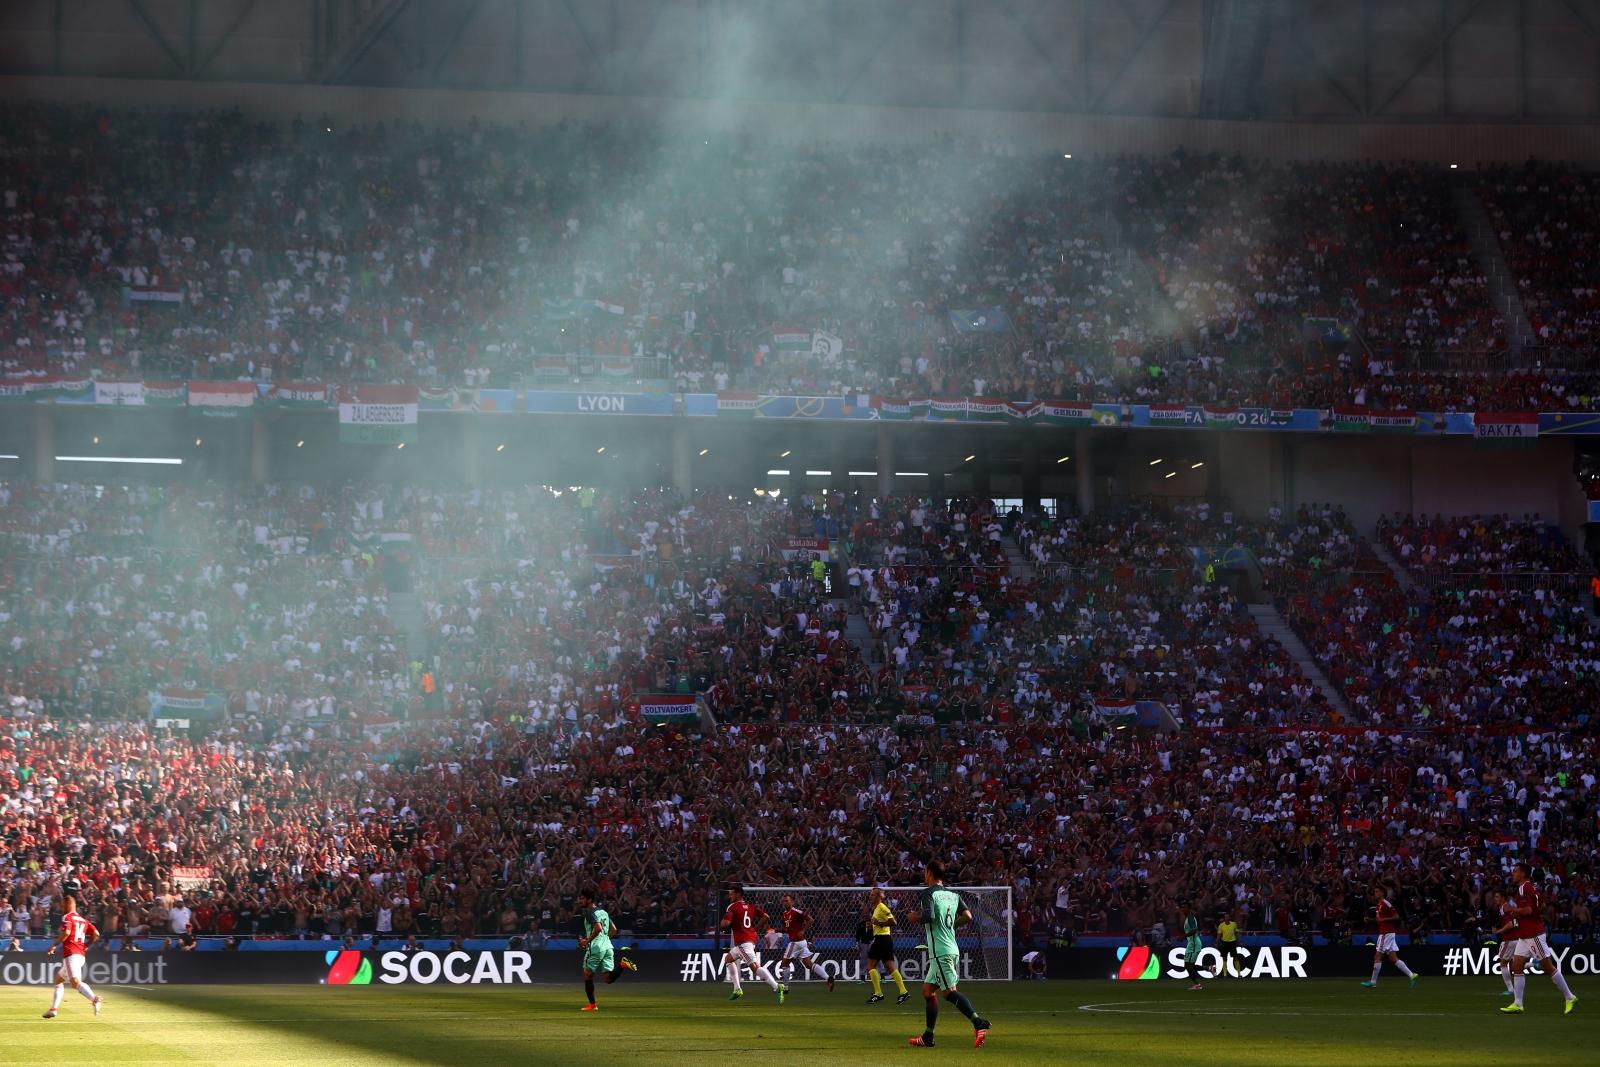 The scene inside the stadium